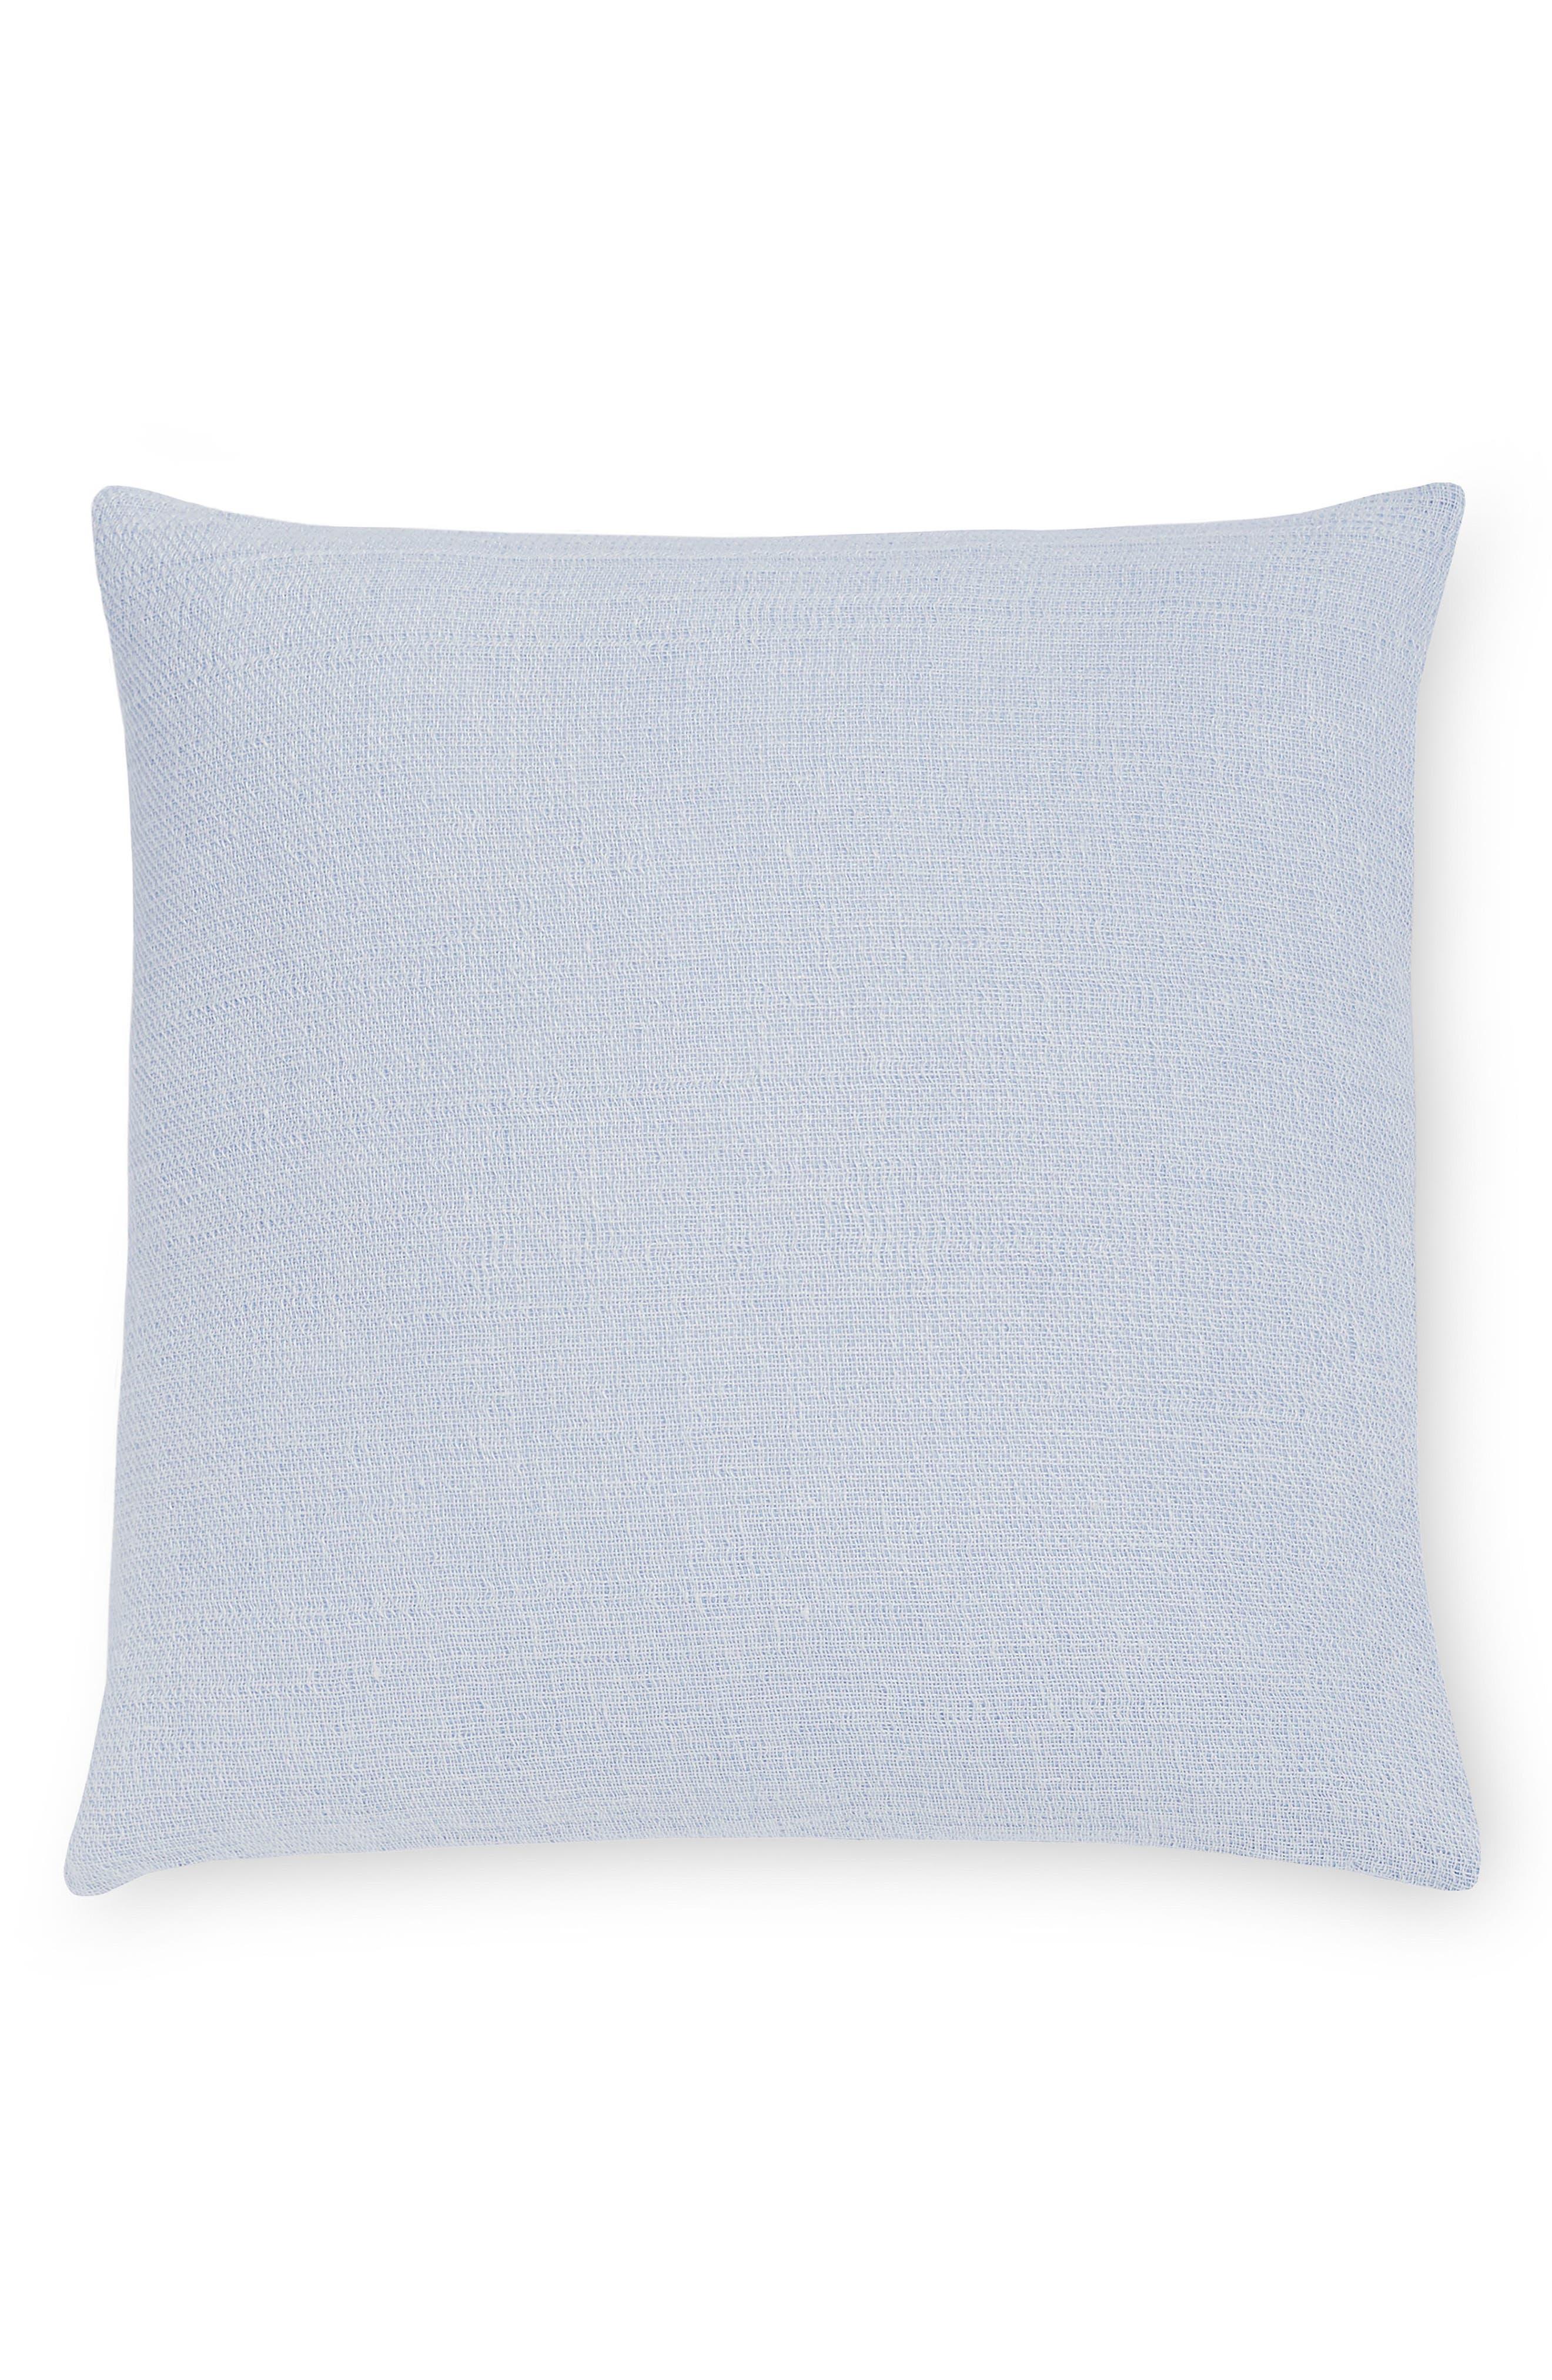 Main Image - SFERRA Perlo Accent Pillow